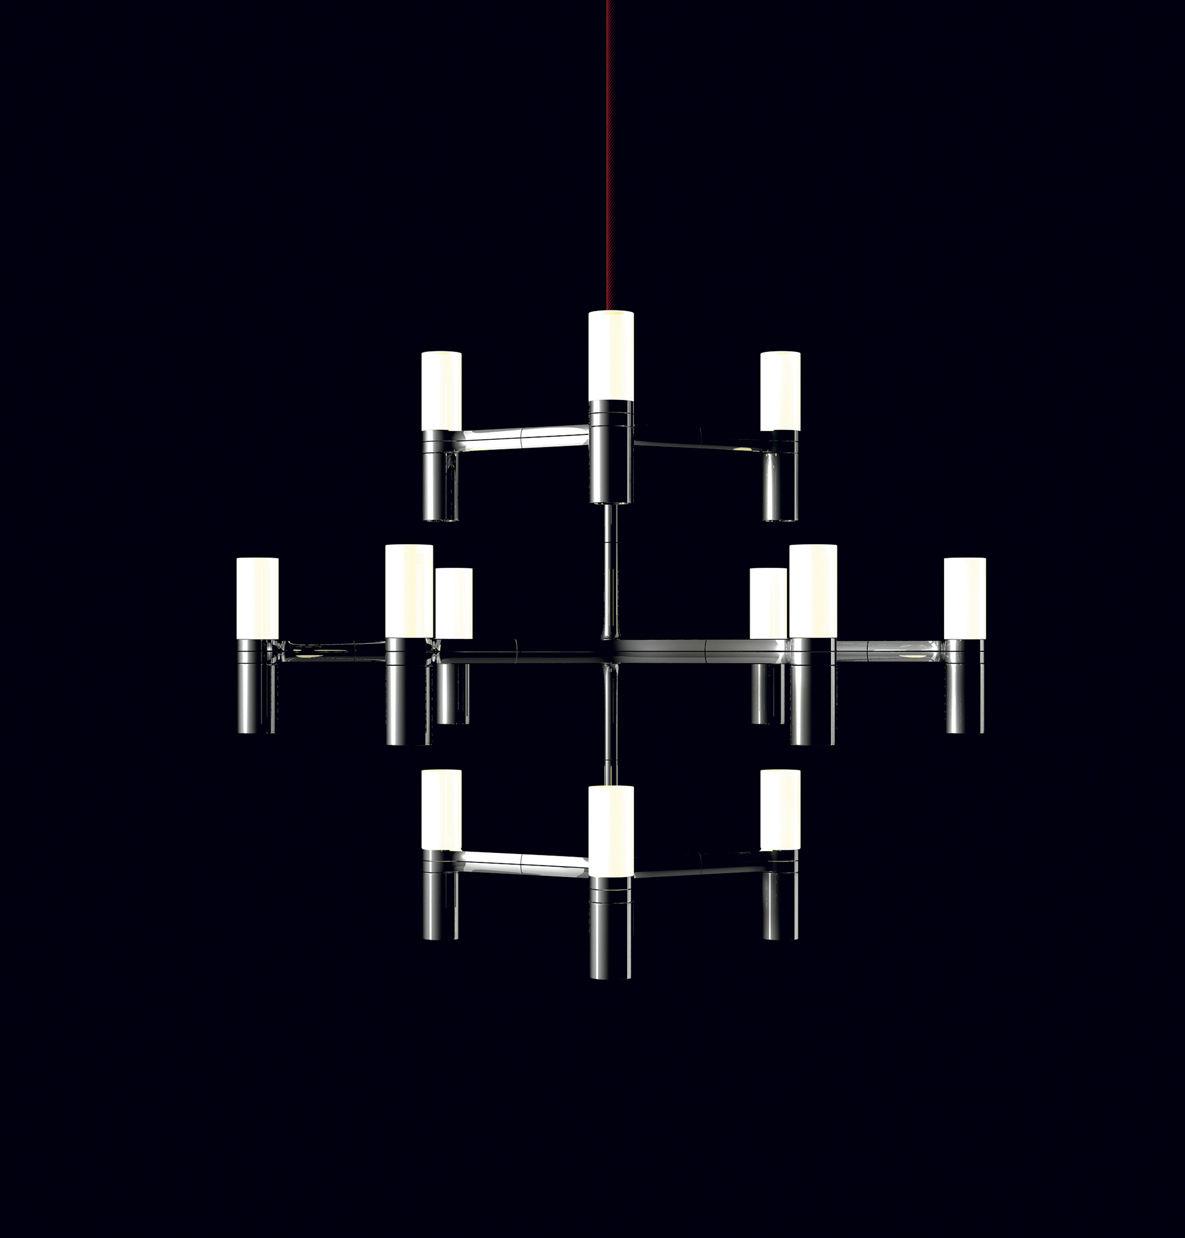 Leuchten - Pendelleuchten - Crown Minor Pendelleuchte / Ø 77 cm - Nemo - Aluminium - Aluminium, Opalglas